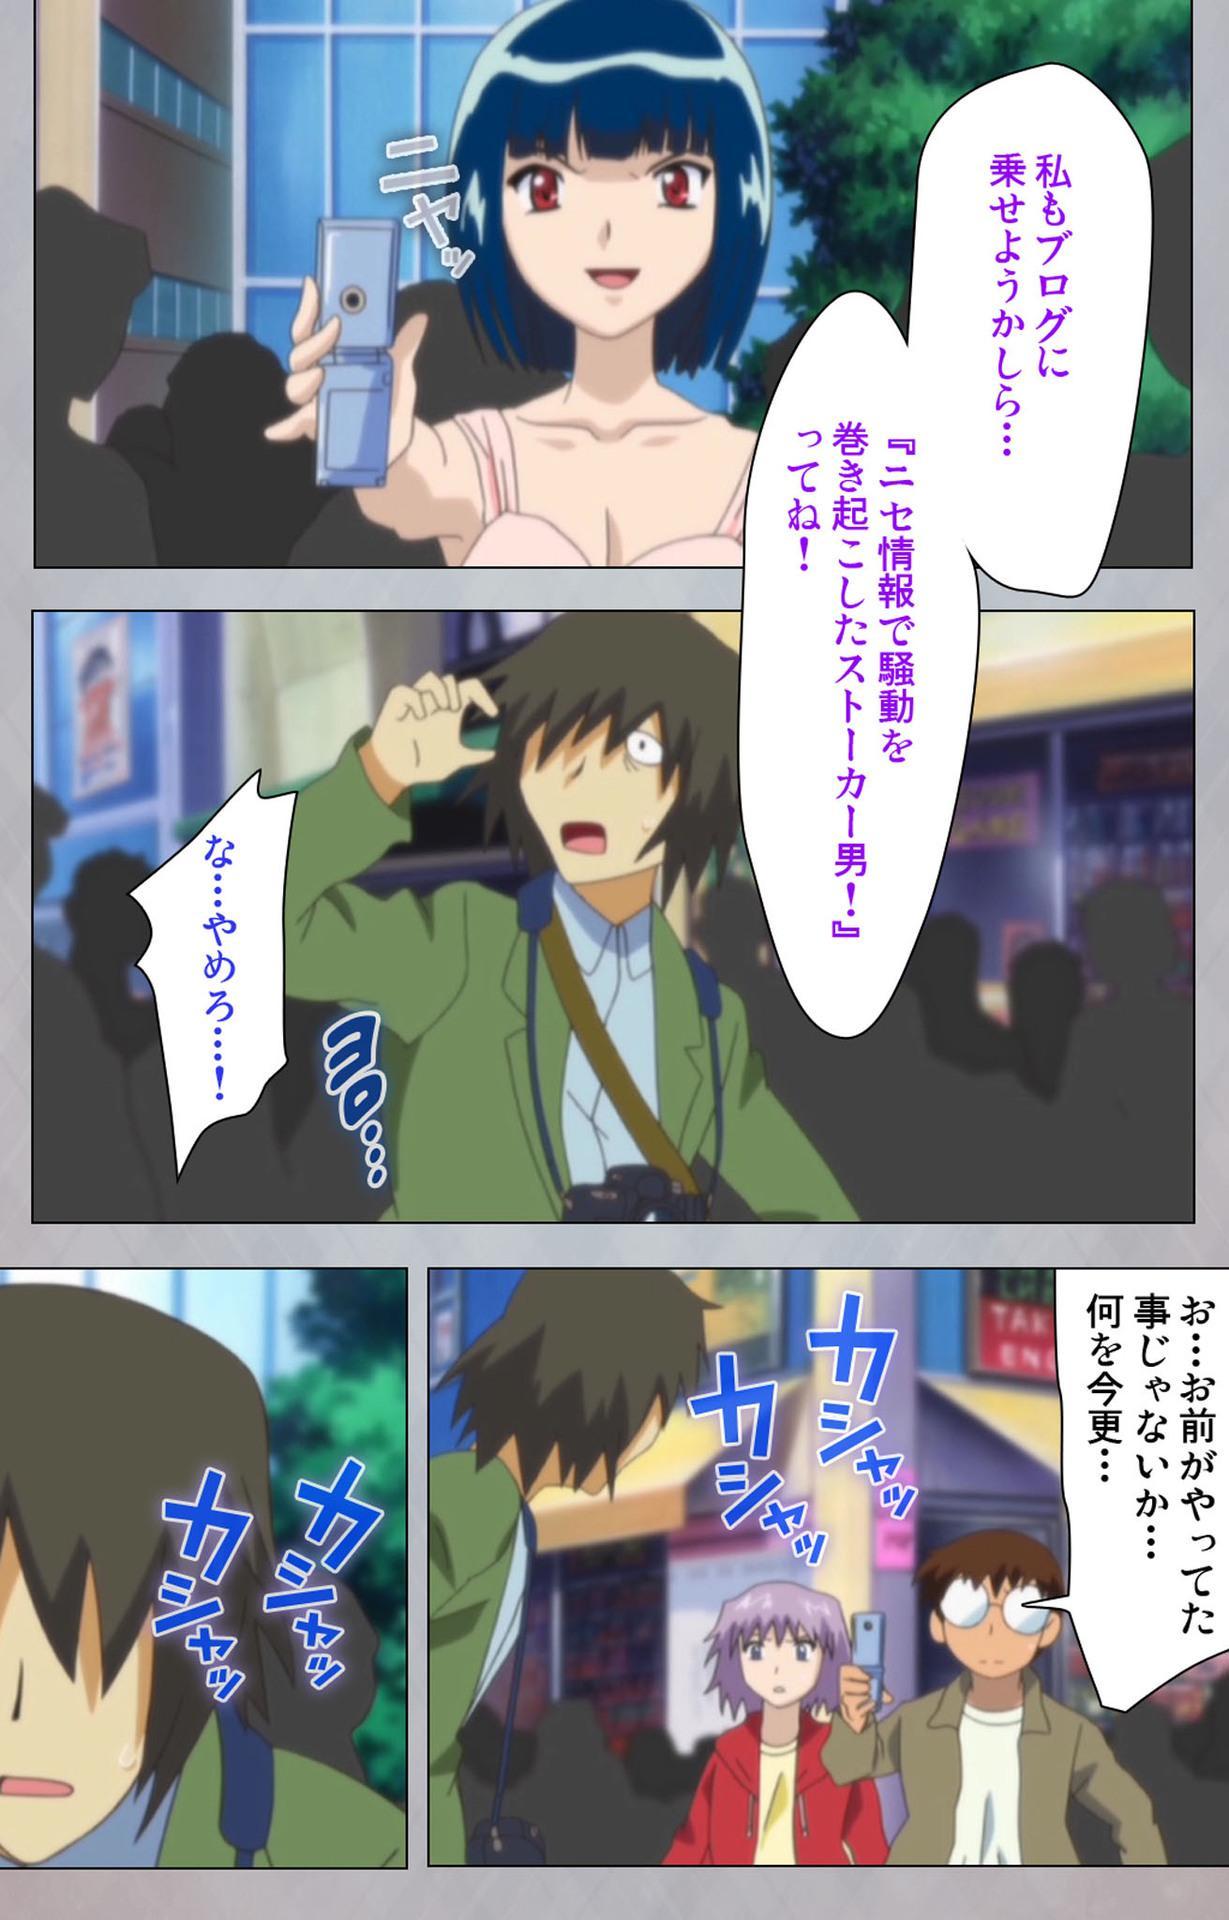 [Digital Works] [Full Color Seijin Ban] Sex Android ~Risou no Onna de Nuite yaru~ Kanzenban 185